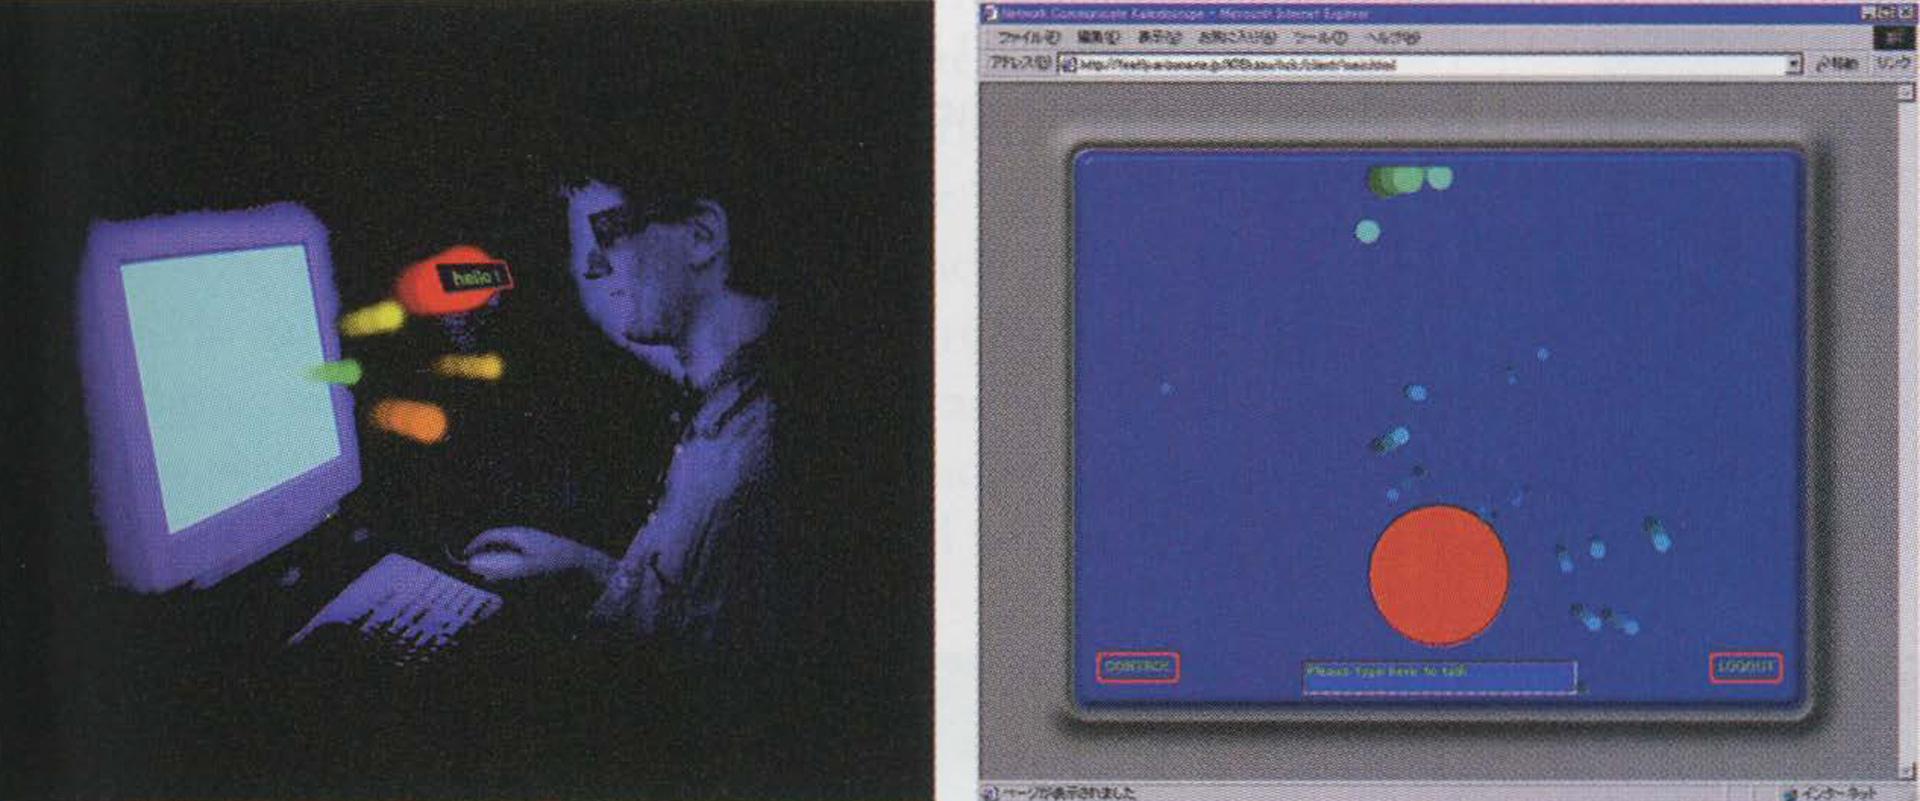 ©2000, Kazushi Mukaiyama